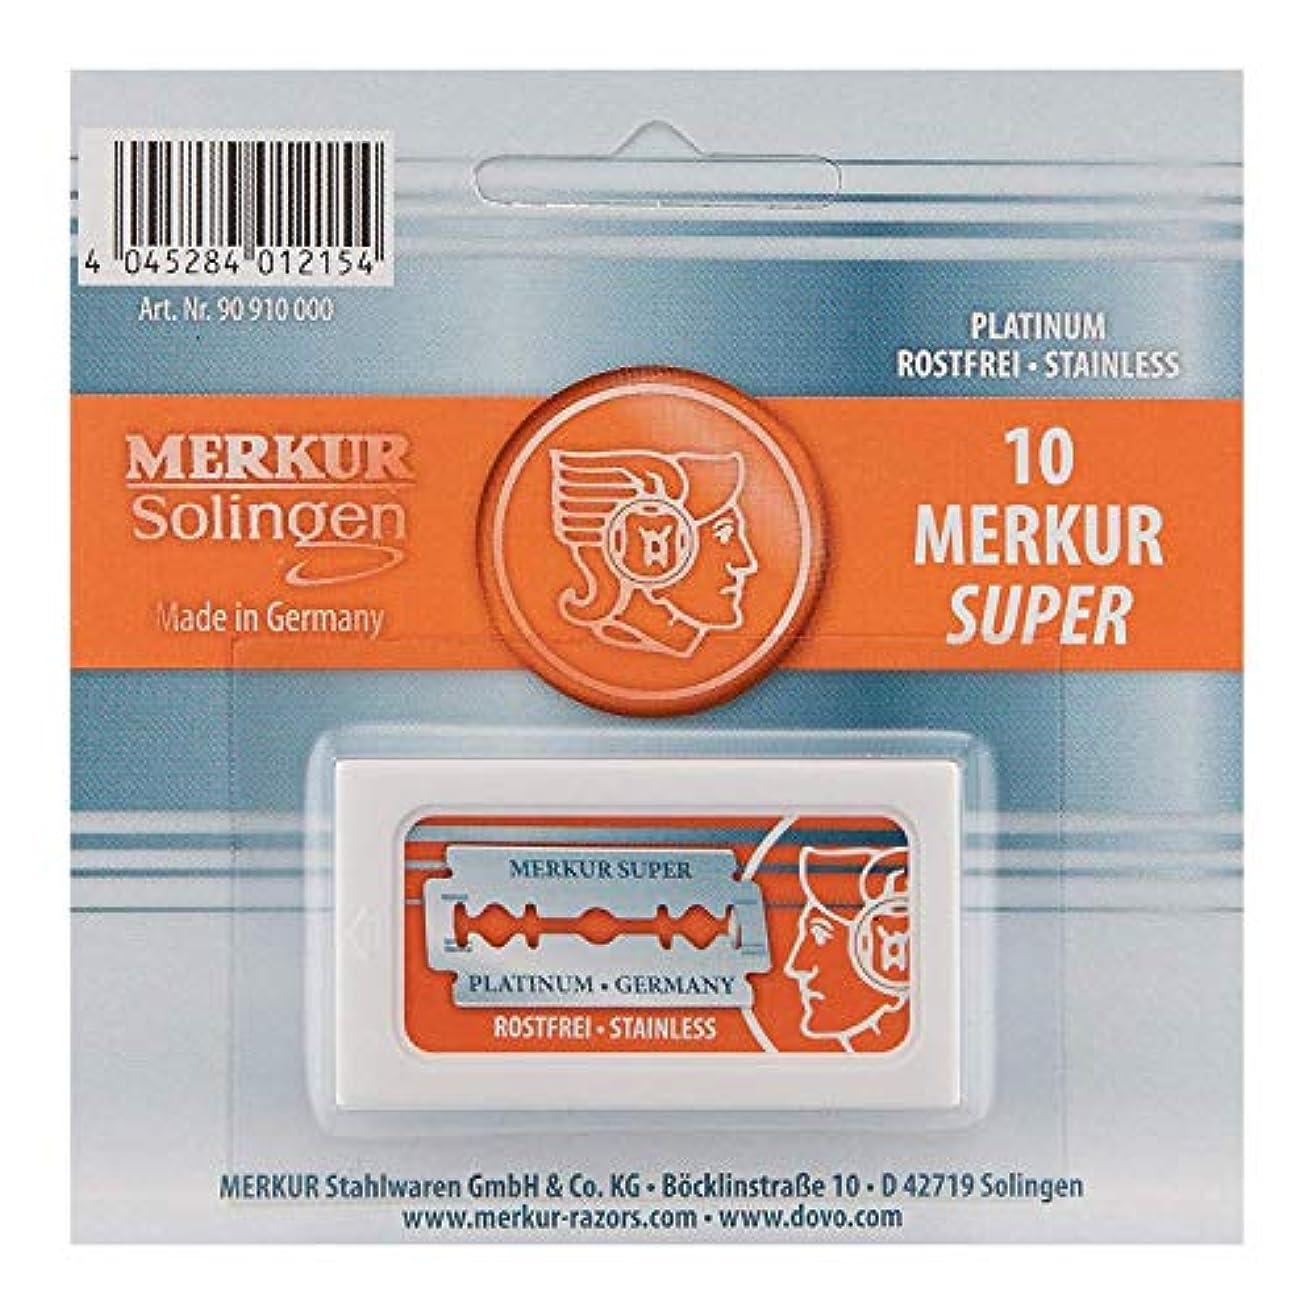 一自動車雨Merkur Stainless Platinum Safety Razor Blades 10 Pack